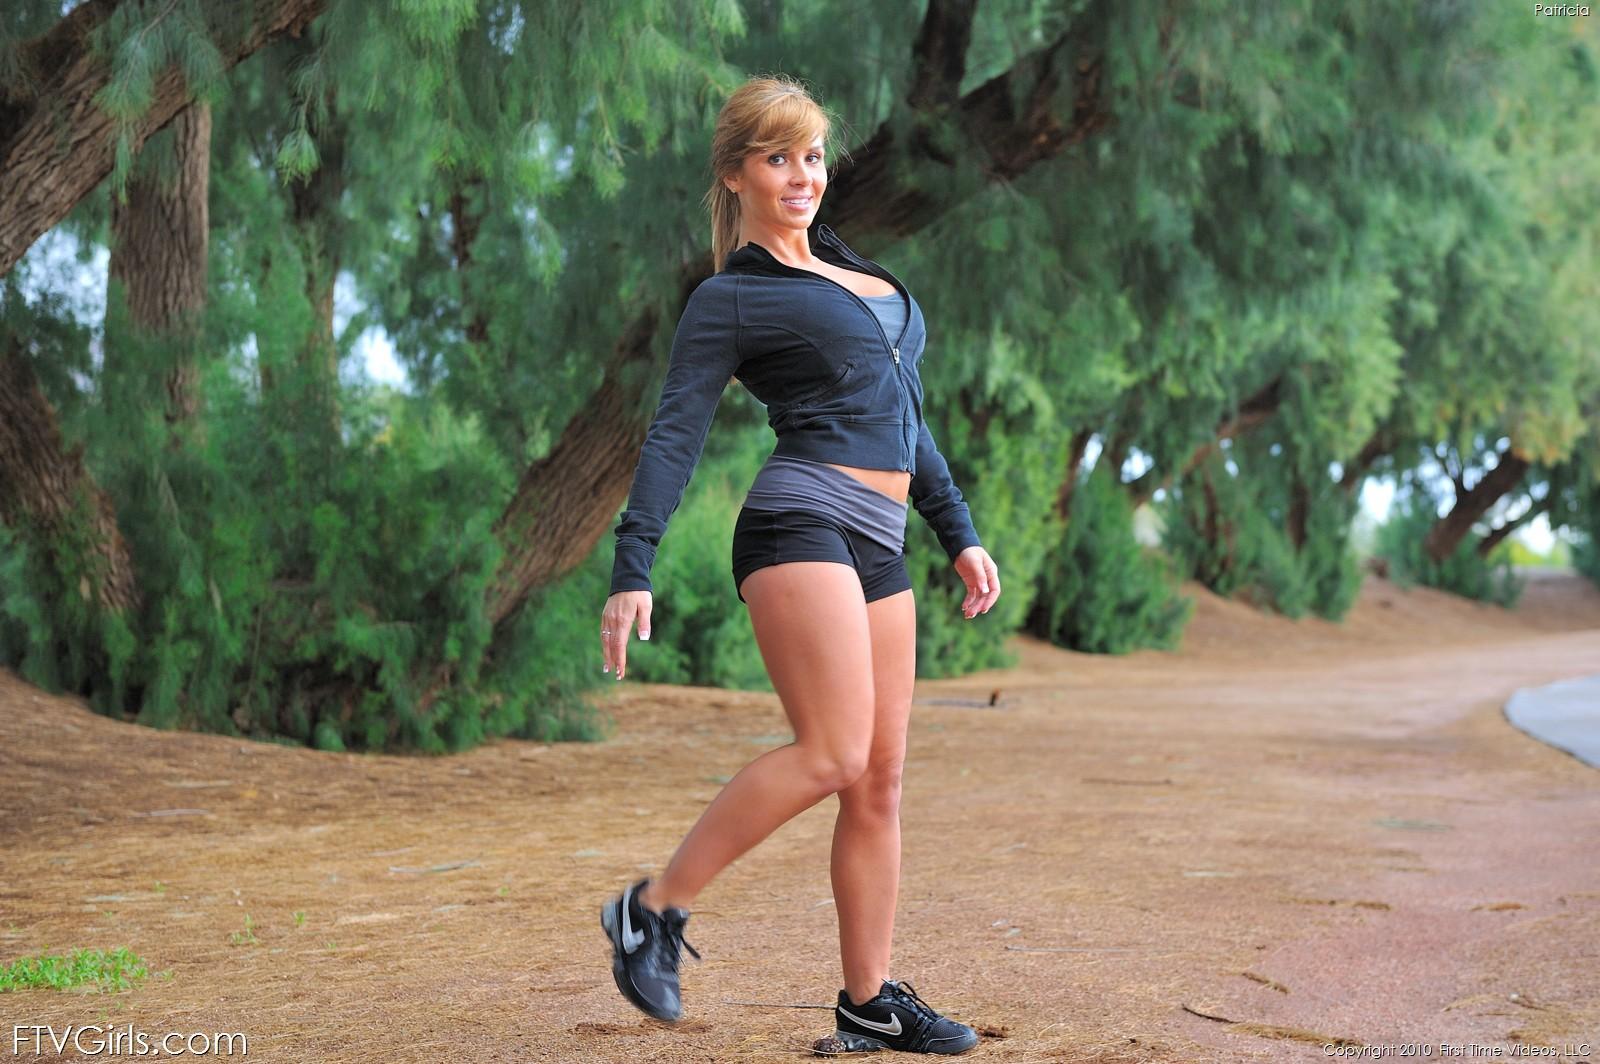 patricia-jogging-ftv-girls-06